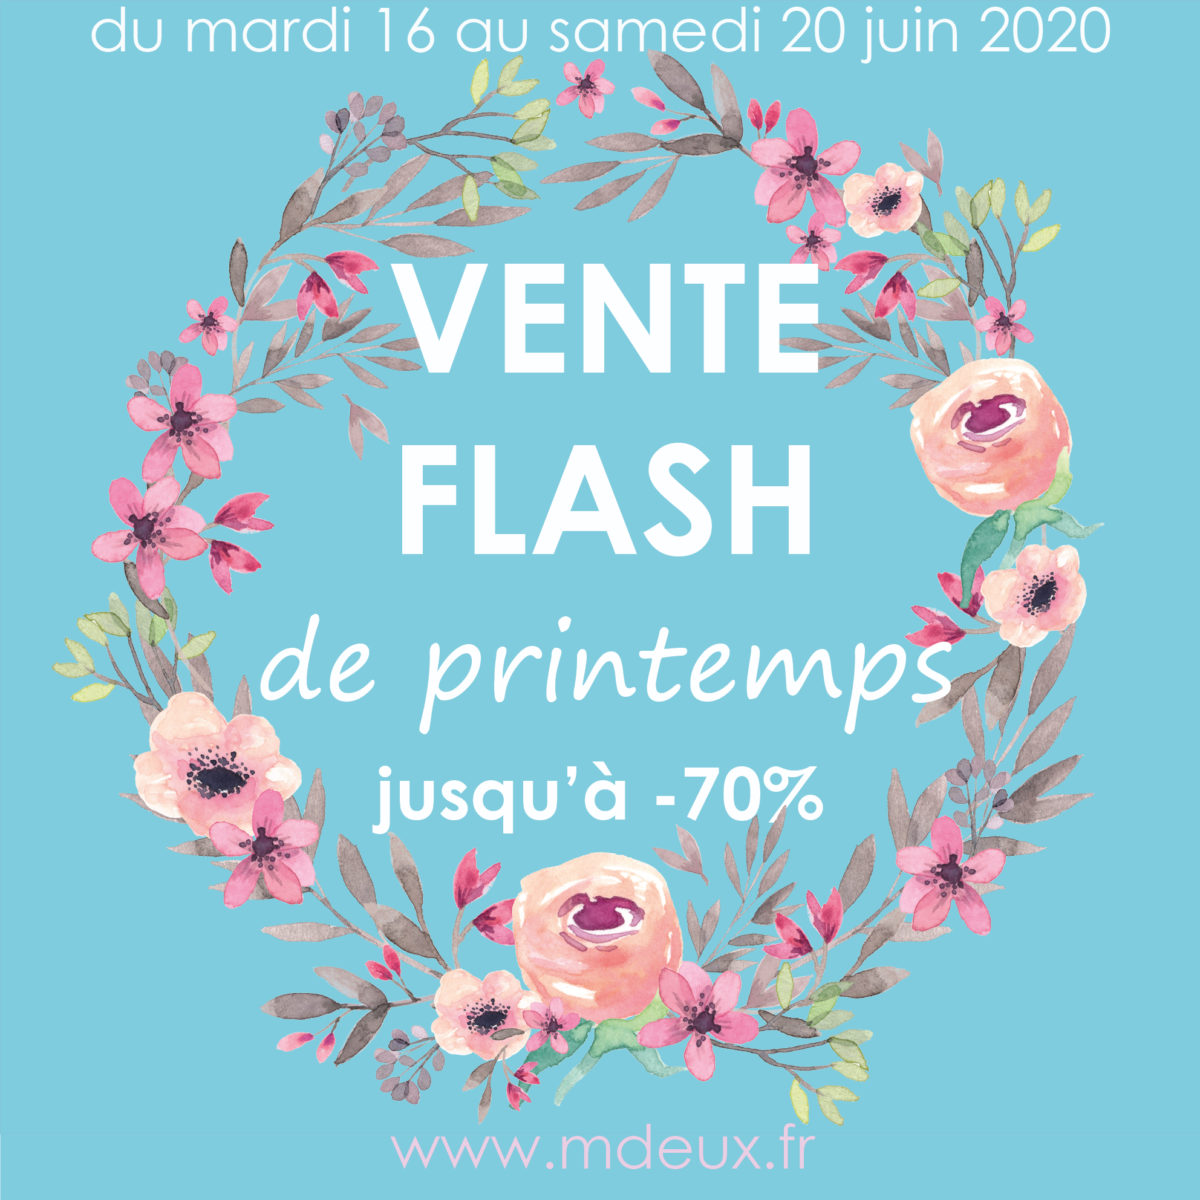 Vente flash de printemps